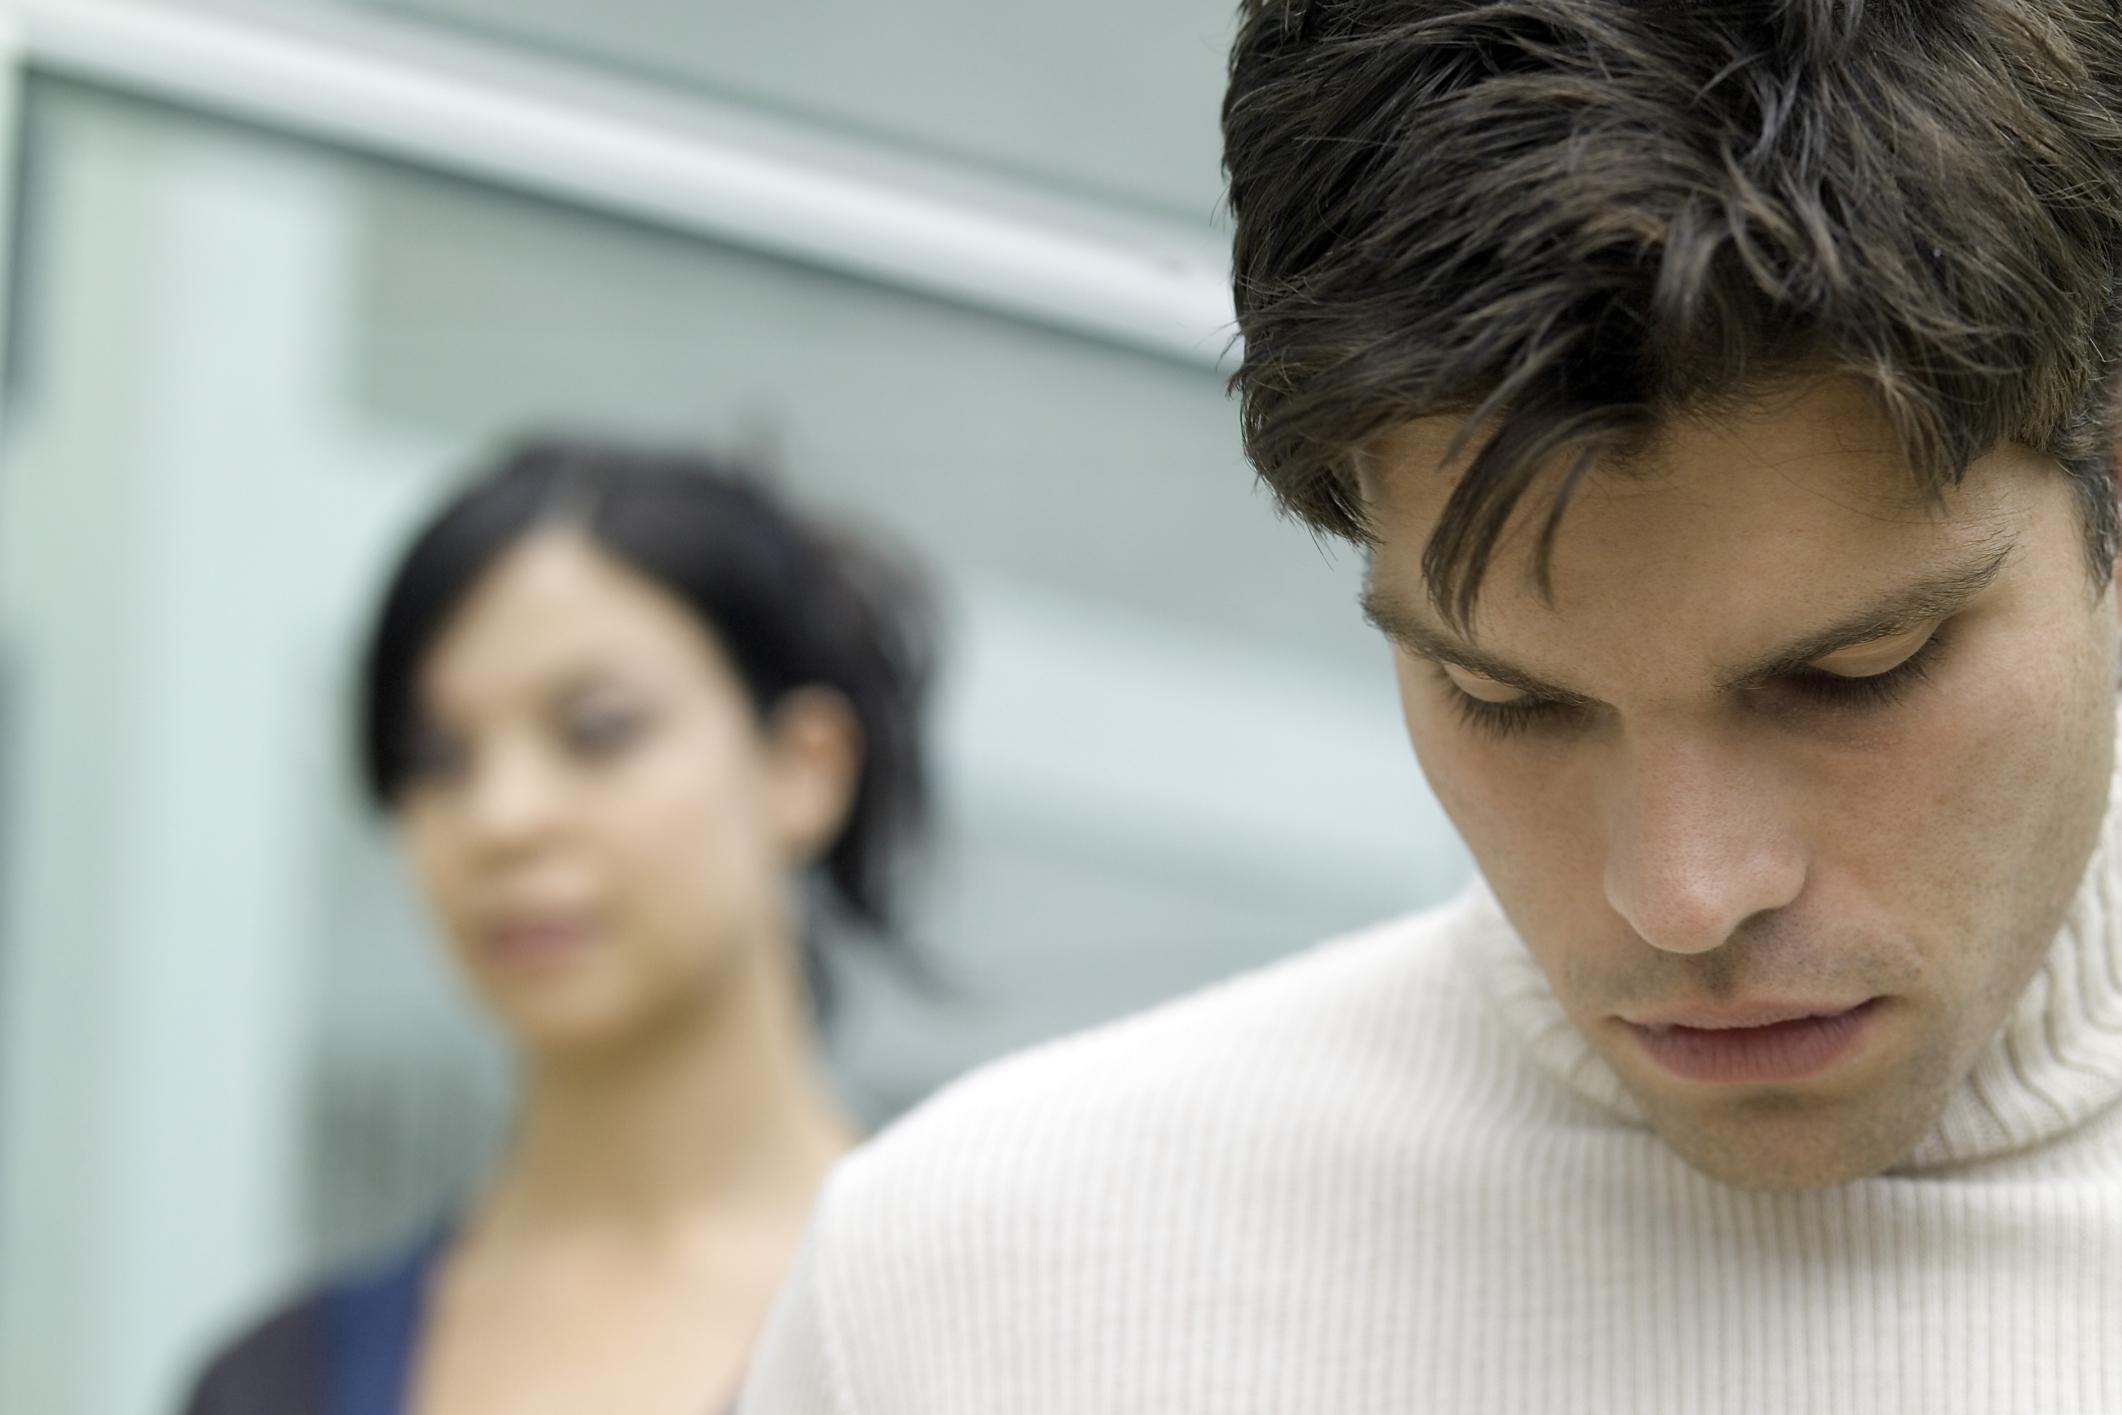 How to Handle a Possessive Husband